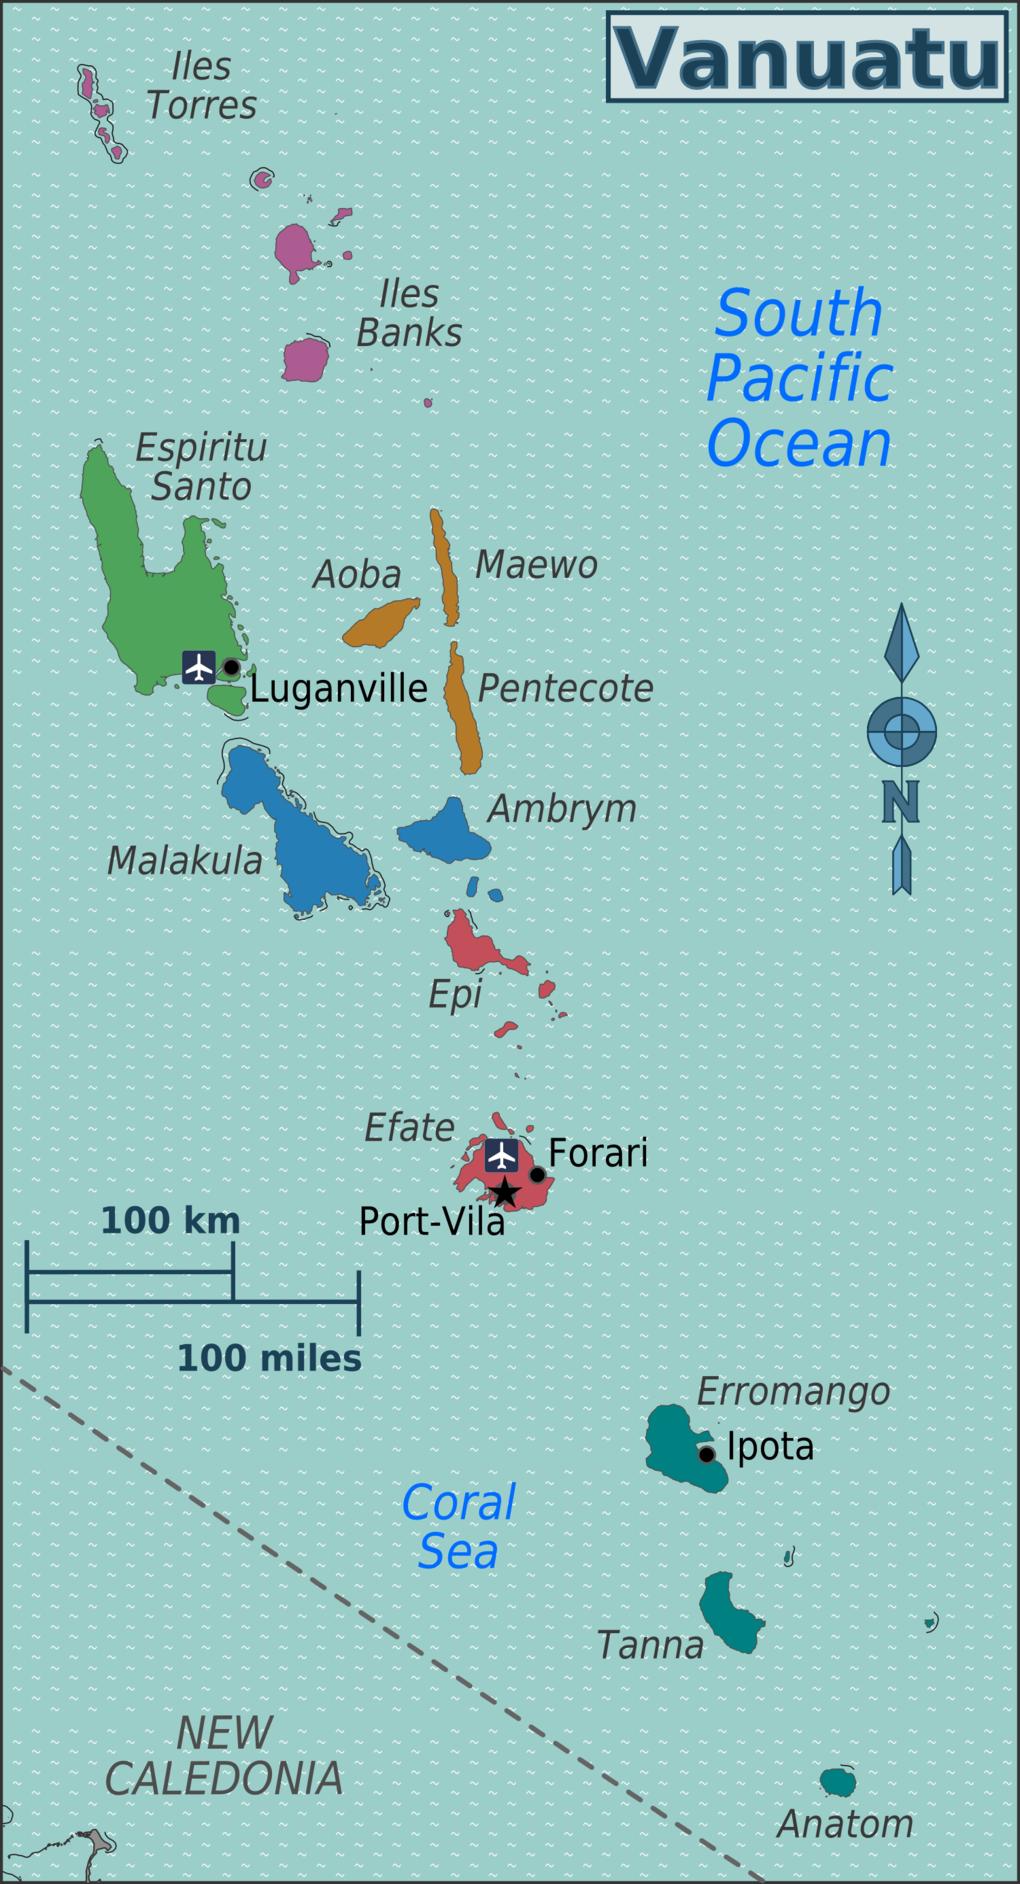 1020px-Vanuatu_Regions_map.png